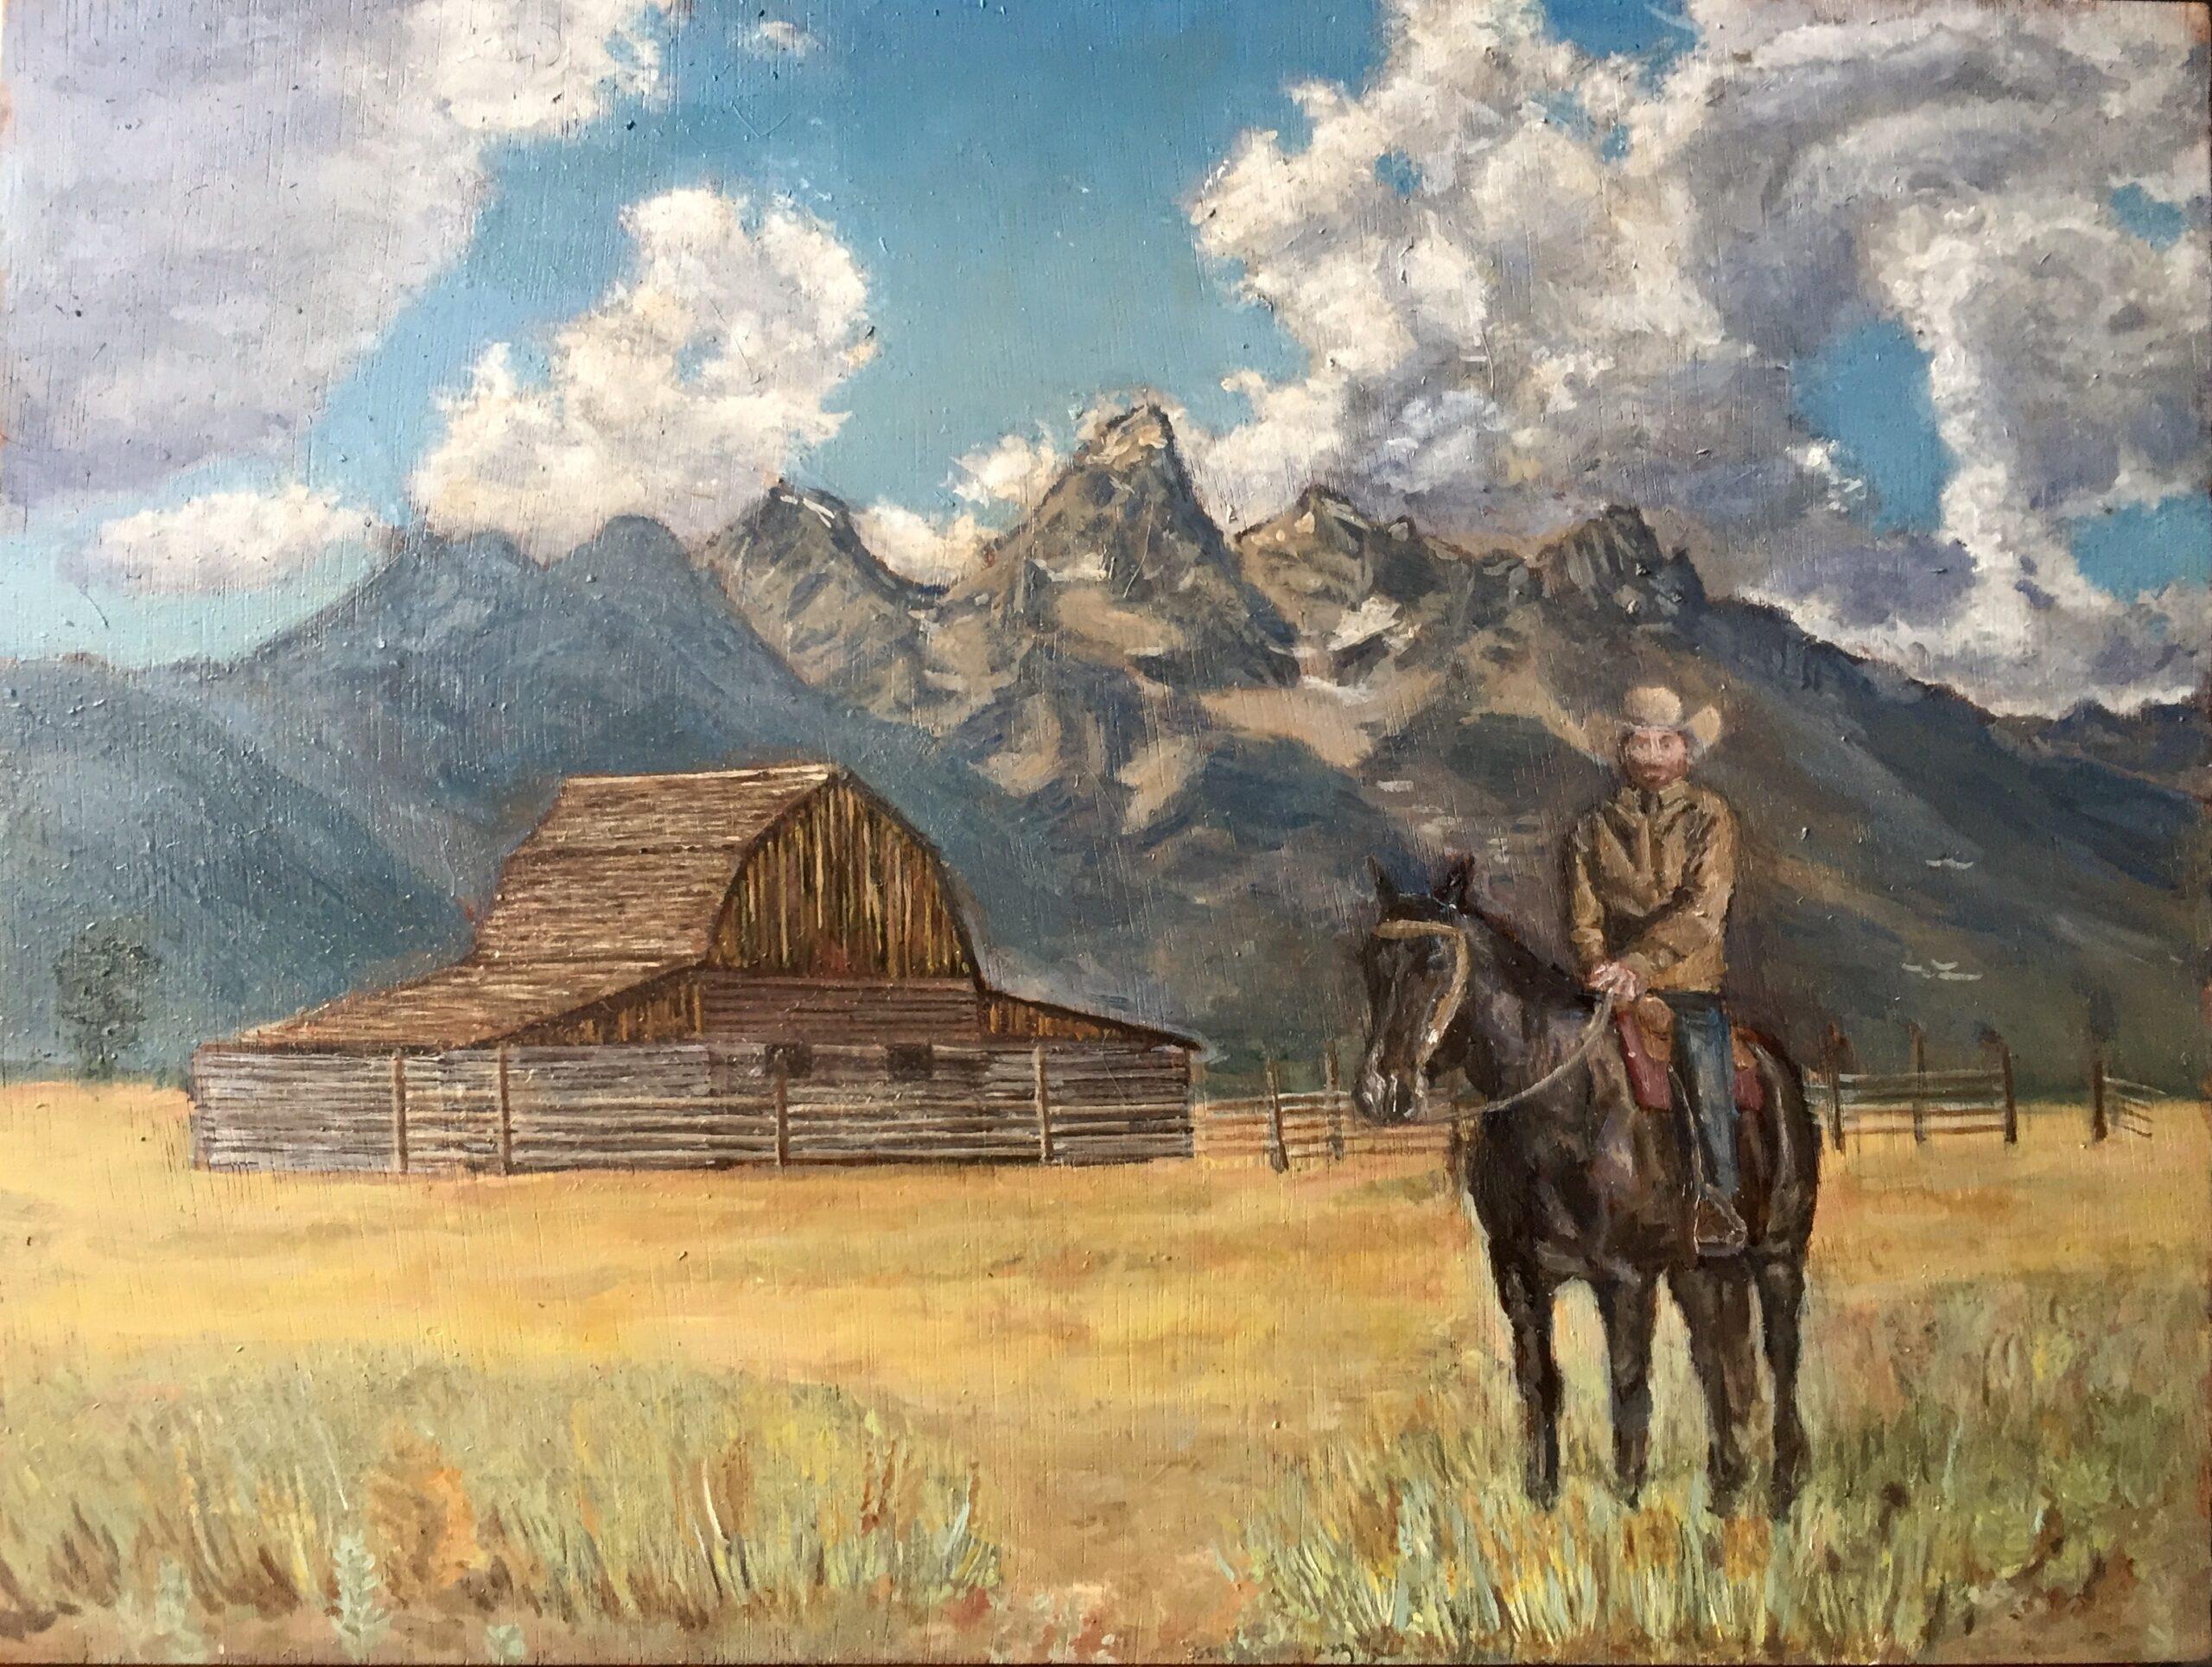 Landscape/western/fantasy oil paintings